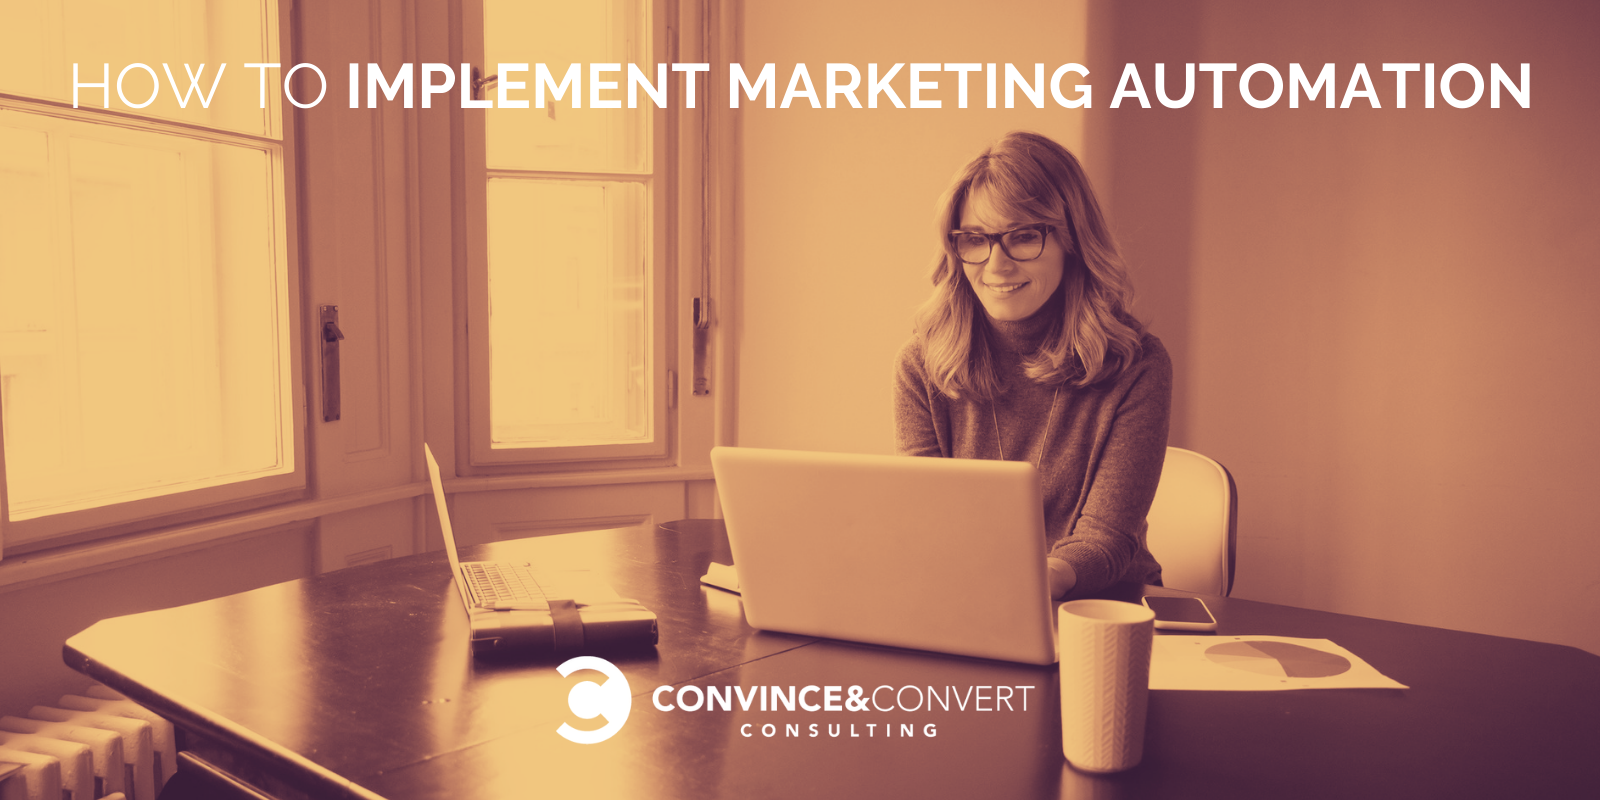 Implement Marketing Automation – Convince & Convert